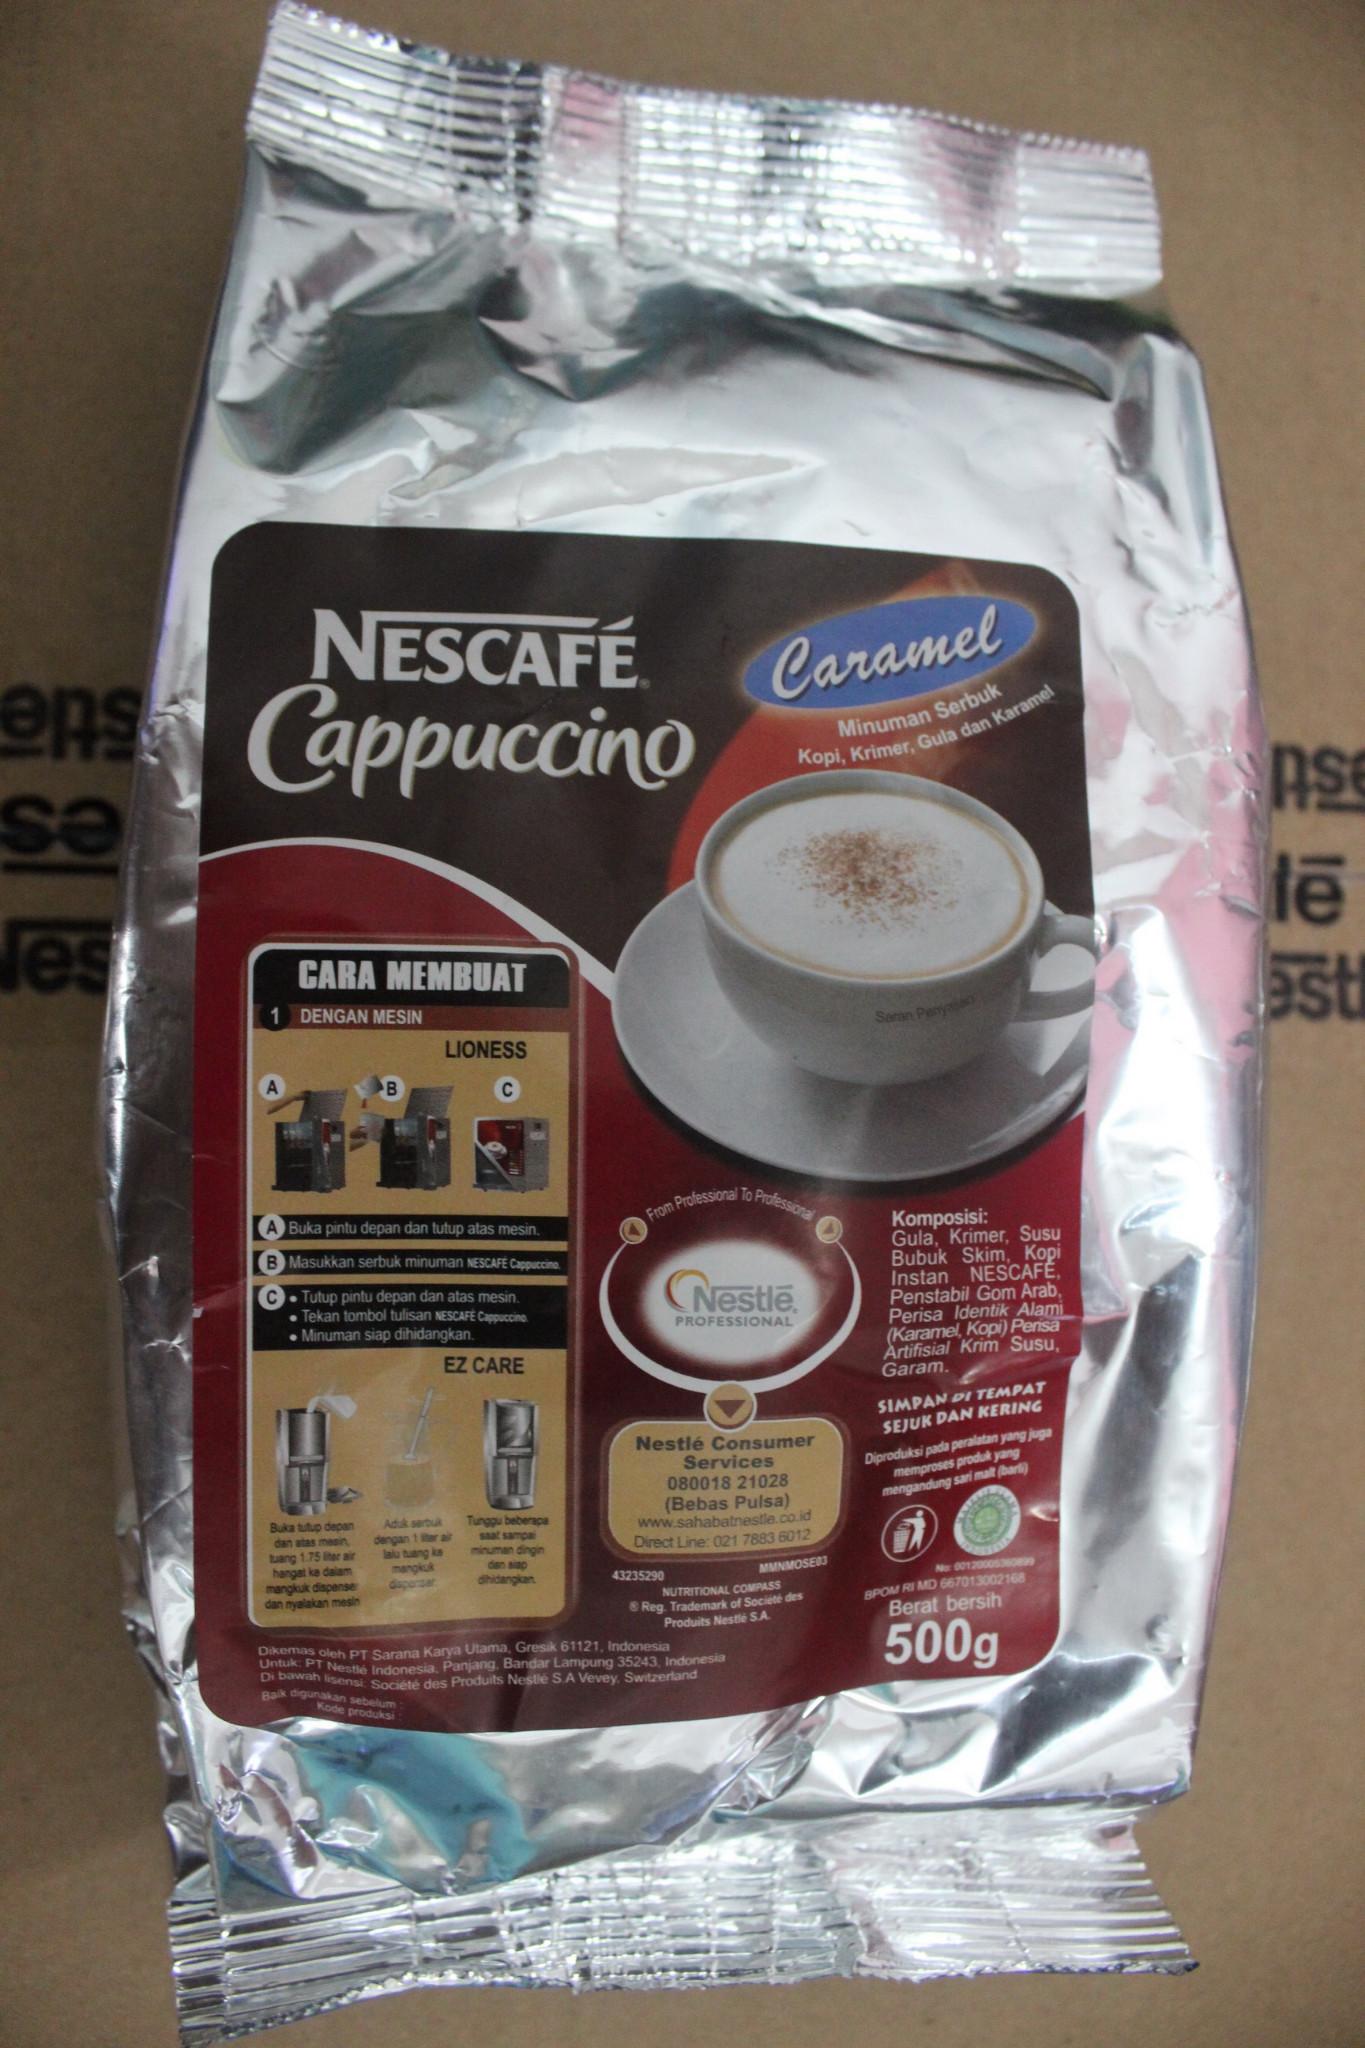 Nescafe Cappucino Caramel By Nestle Professional 500 Gram Daftar Classic 120gram Kualitas Hotel Resto Ampamp Cafe Harga Di Jakarta Barat Cappuccino